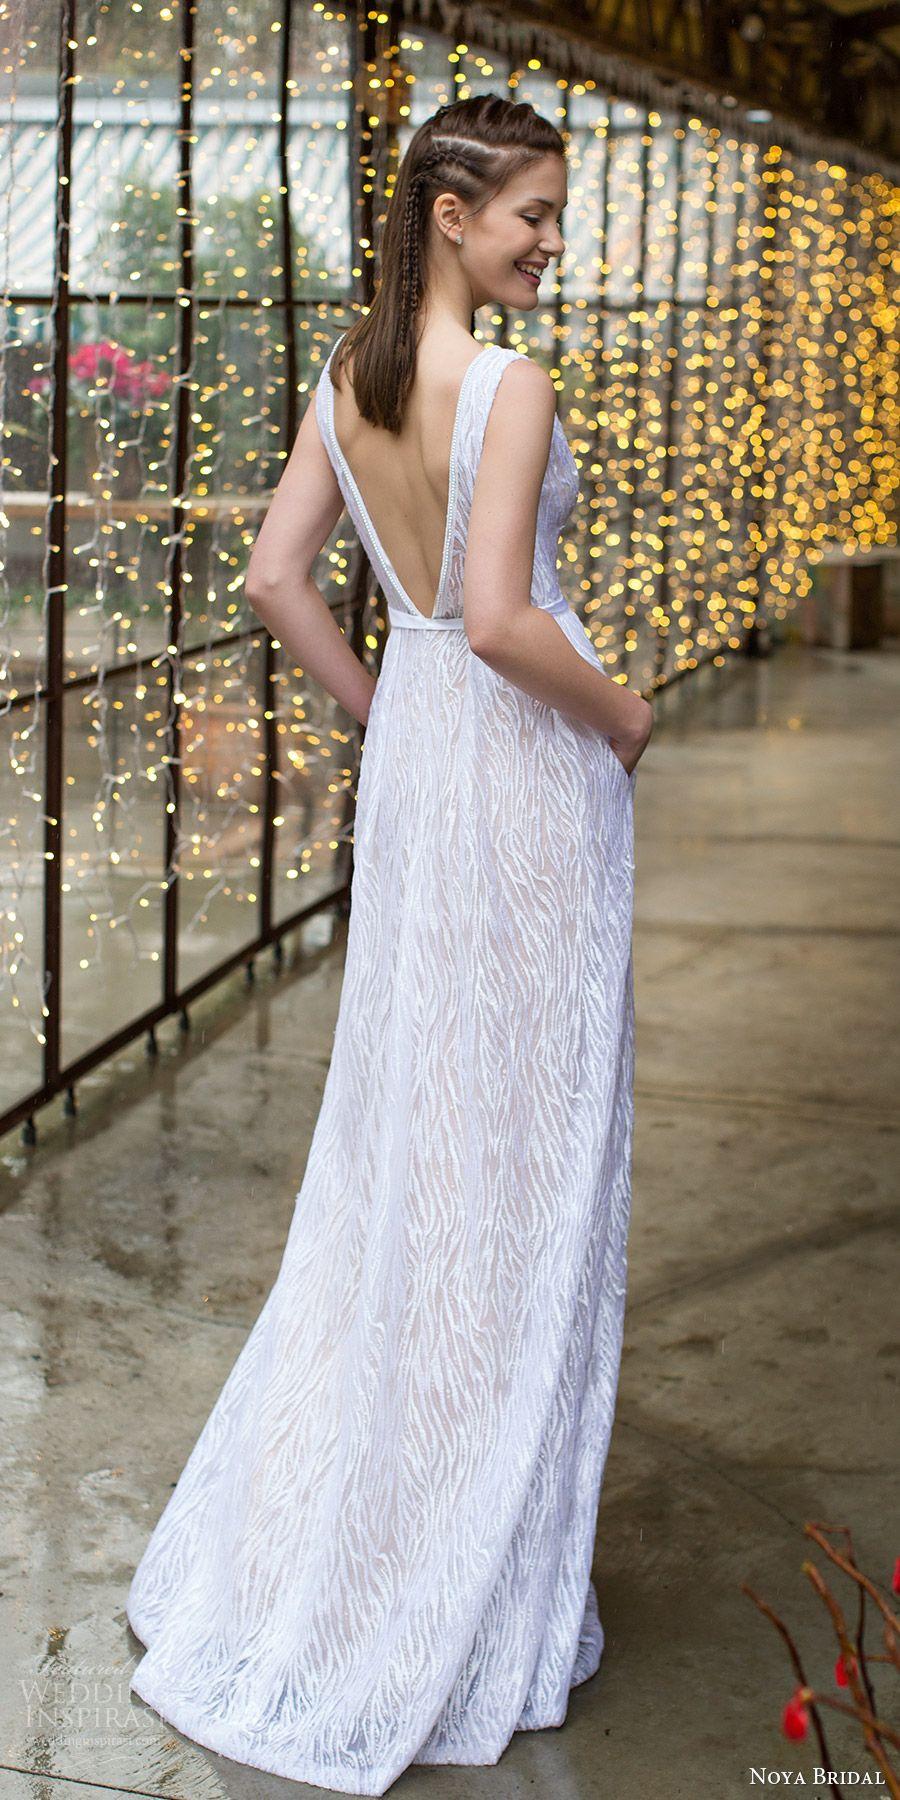 Noya bridal ucariaud collection wedding dresses pinterest wedding